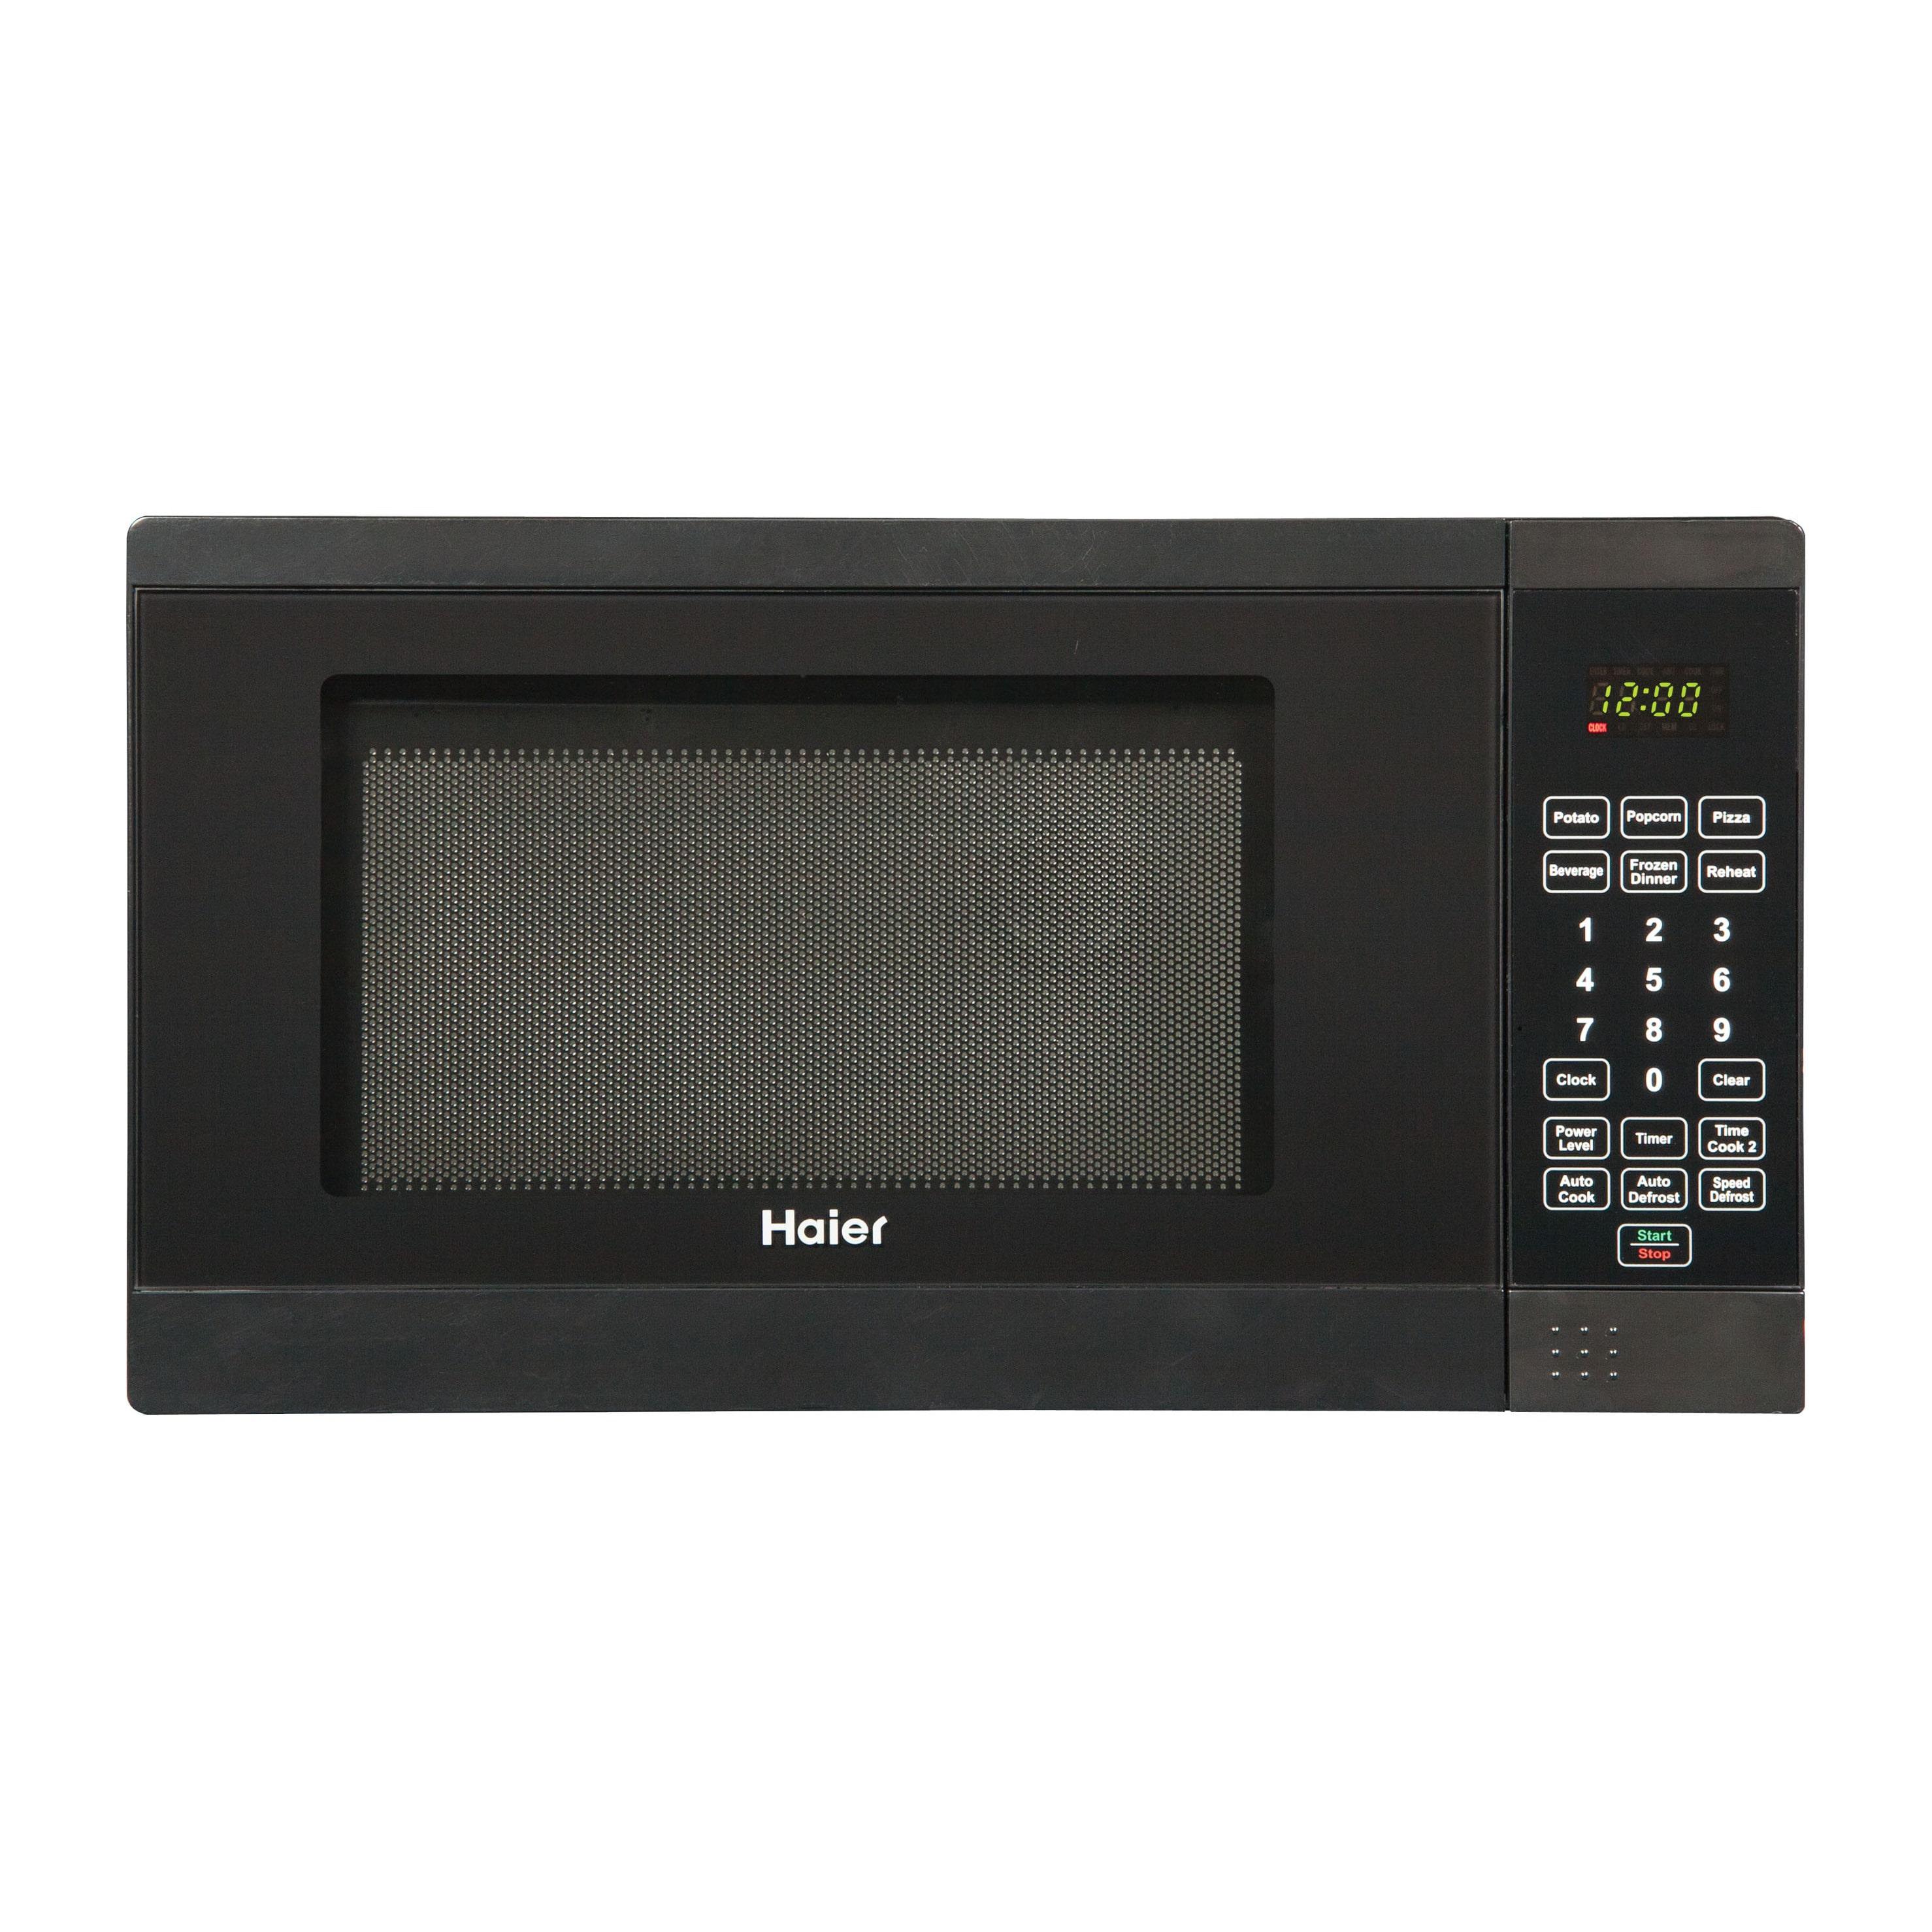 Haier 0 7 Cu Ft Microwave Oven Walmart Com